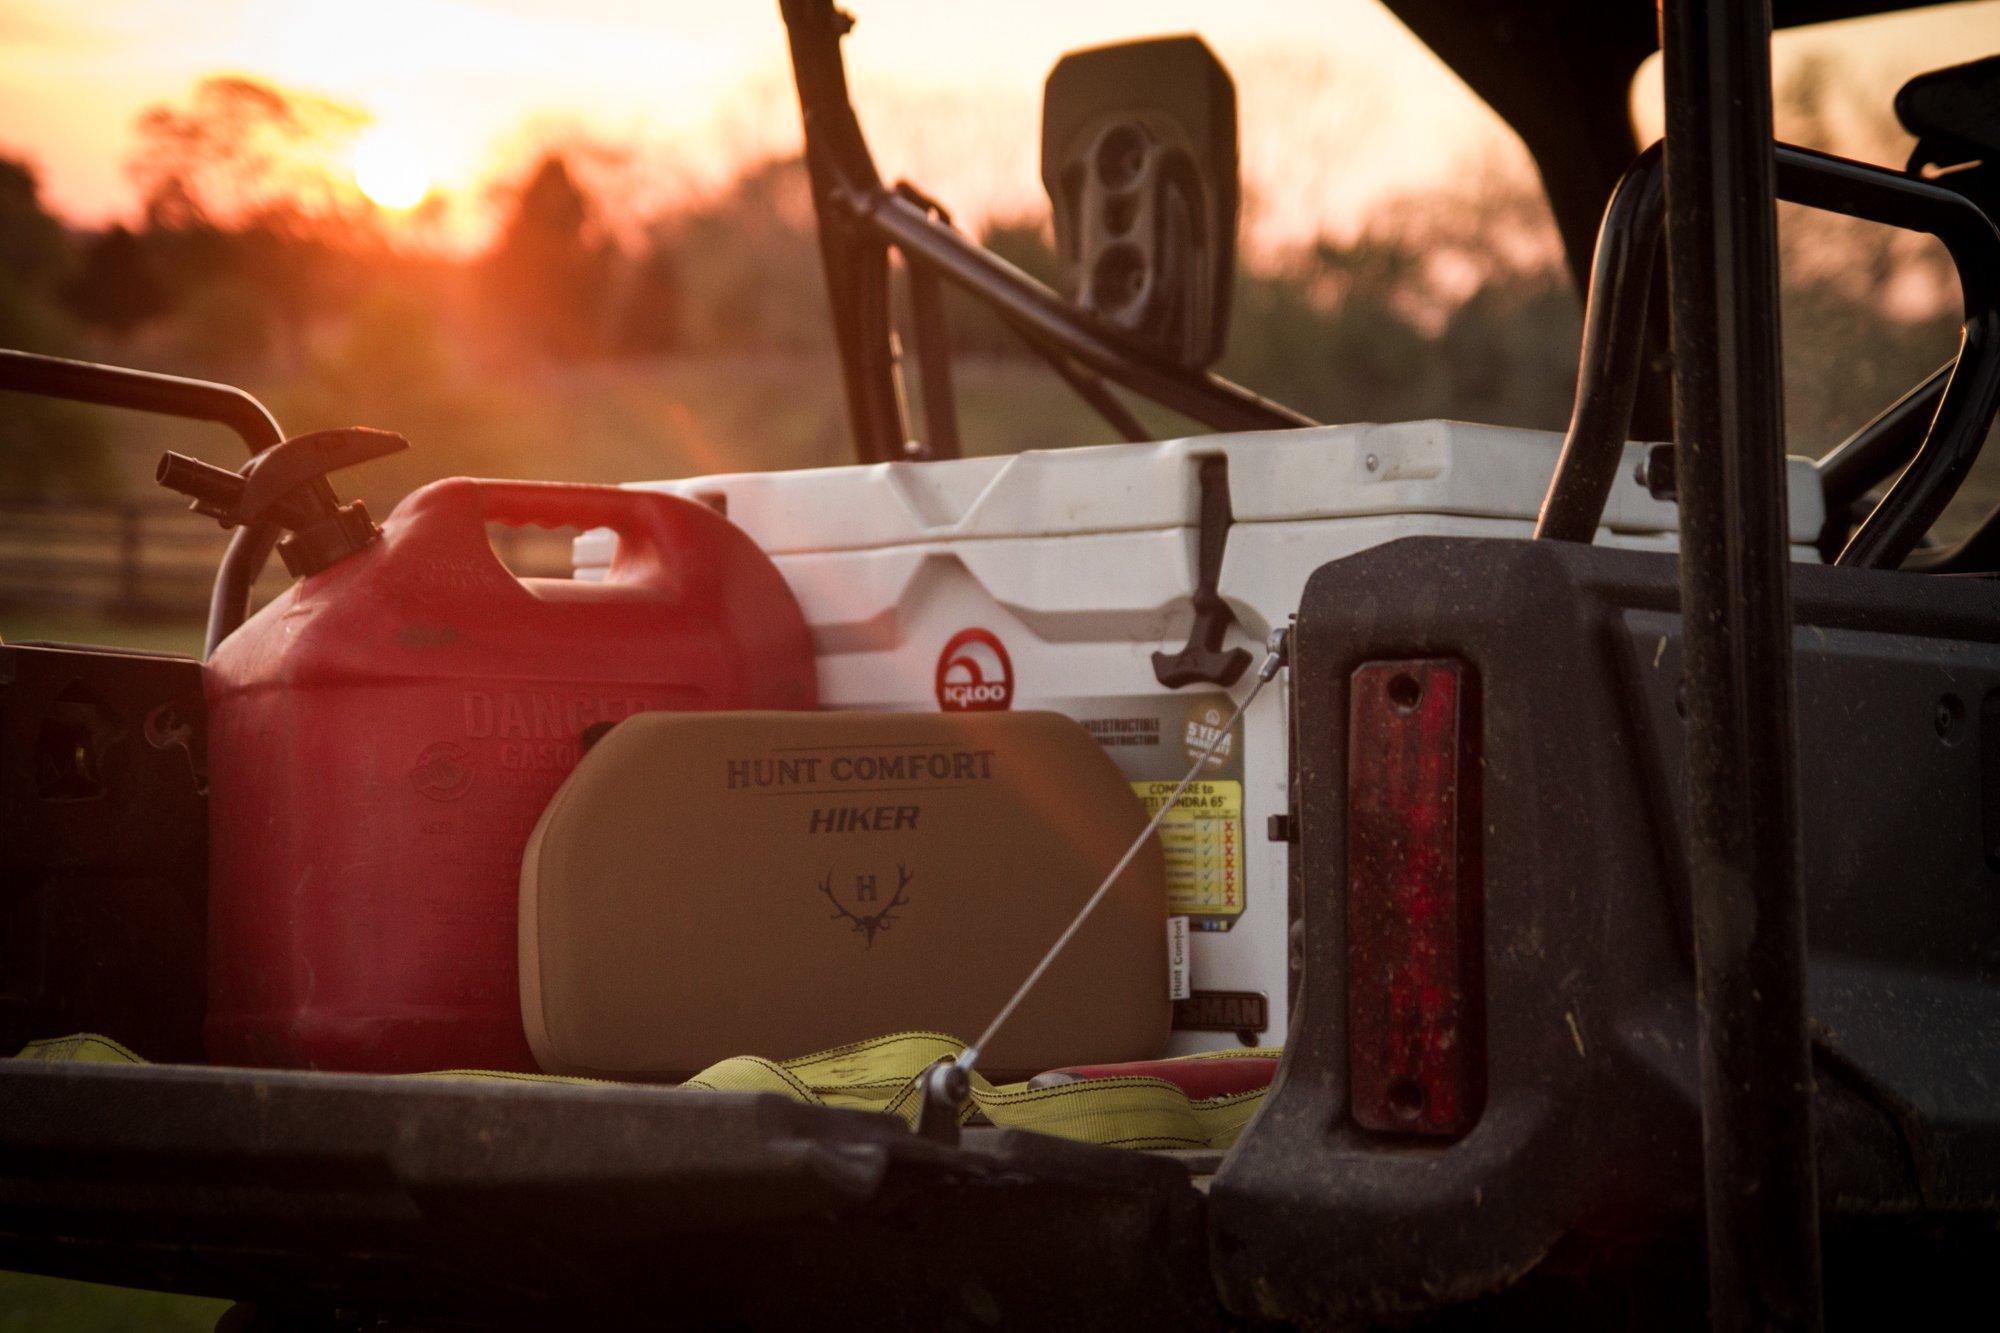 Hunt Comfort Hiker GelCore Hunting Seat, Coyote Brown by Hunt Comfort (Image #7)